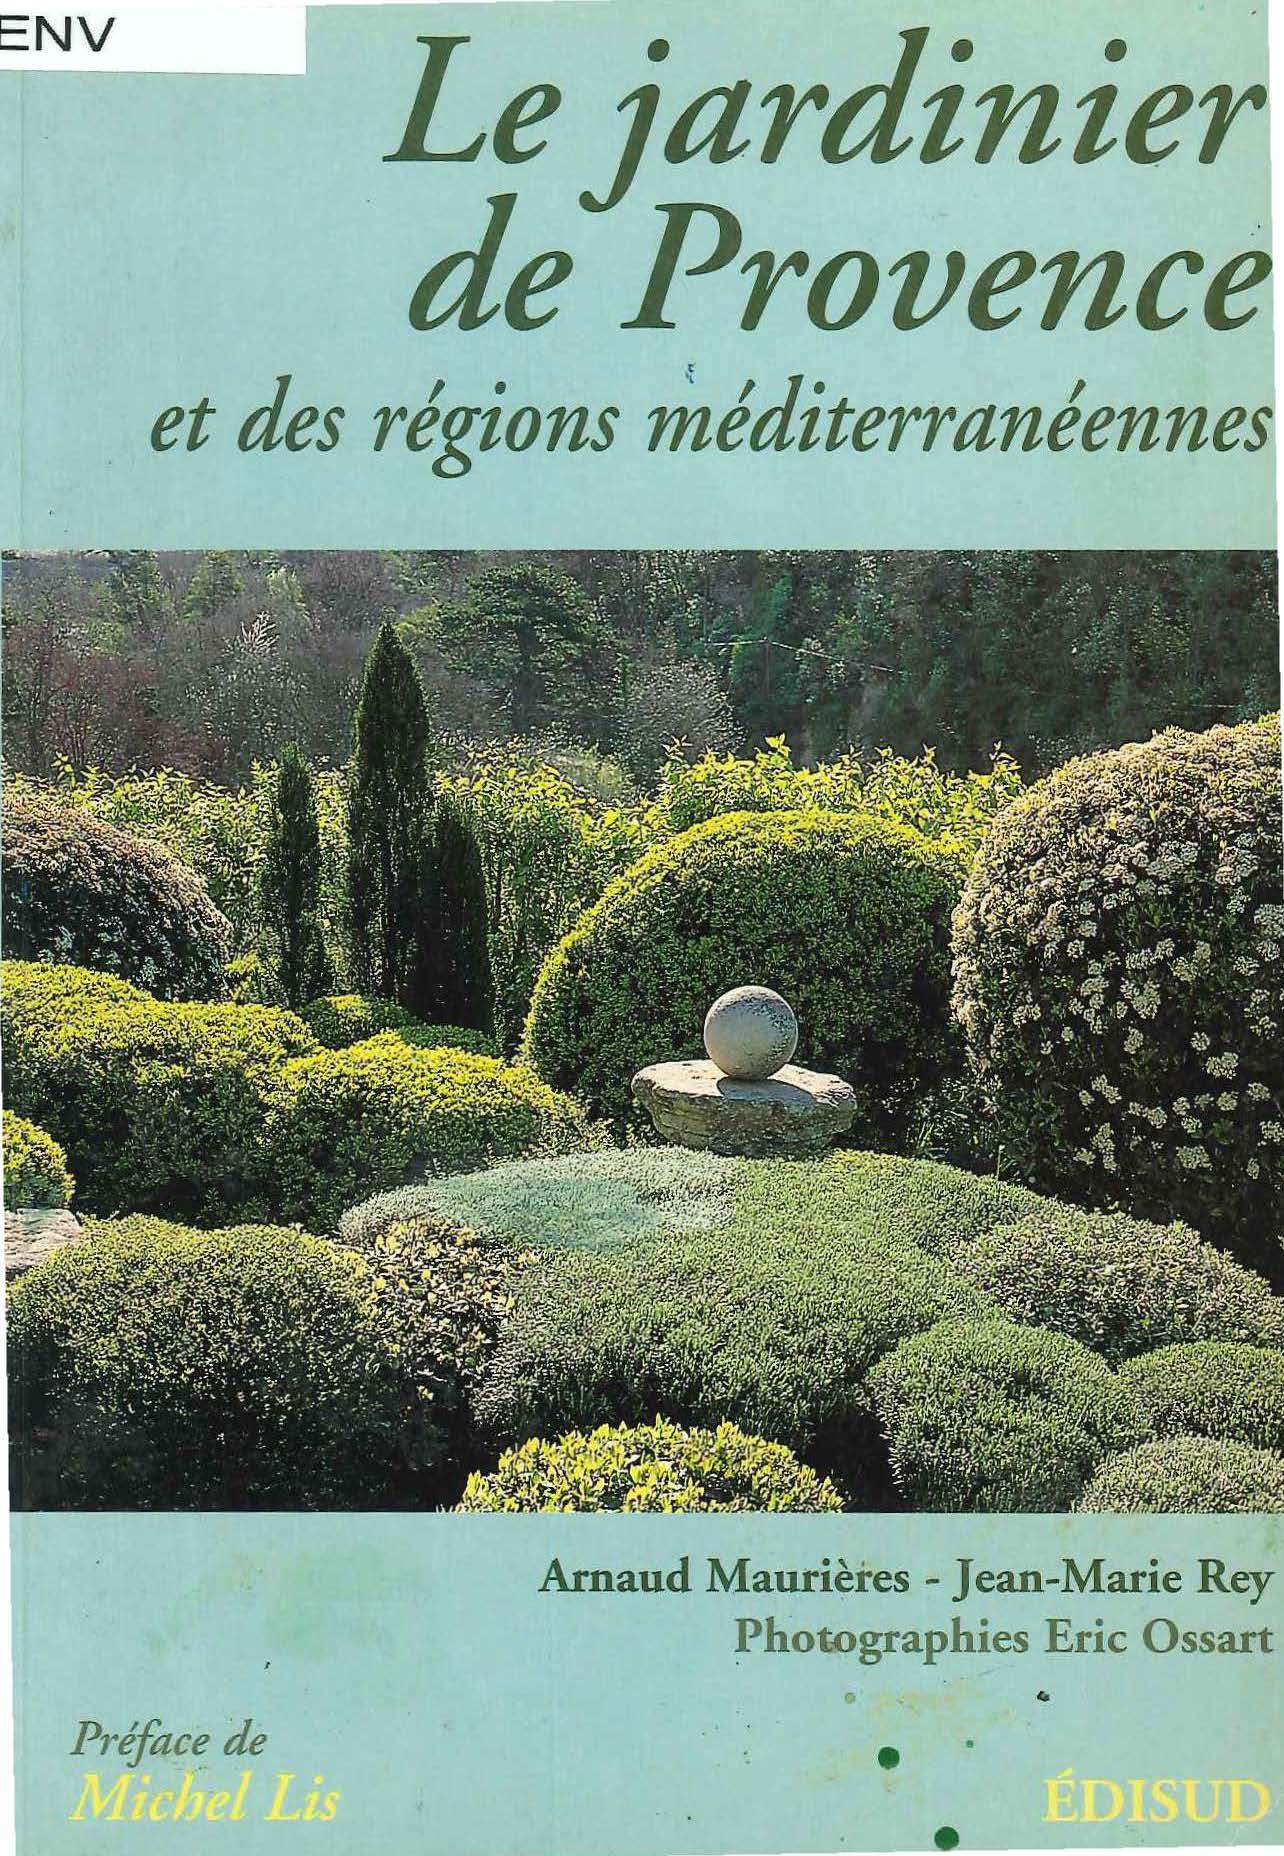 Le Jardinier de Provence